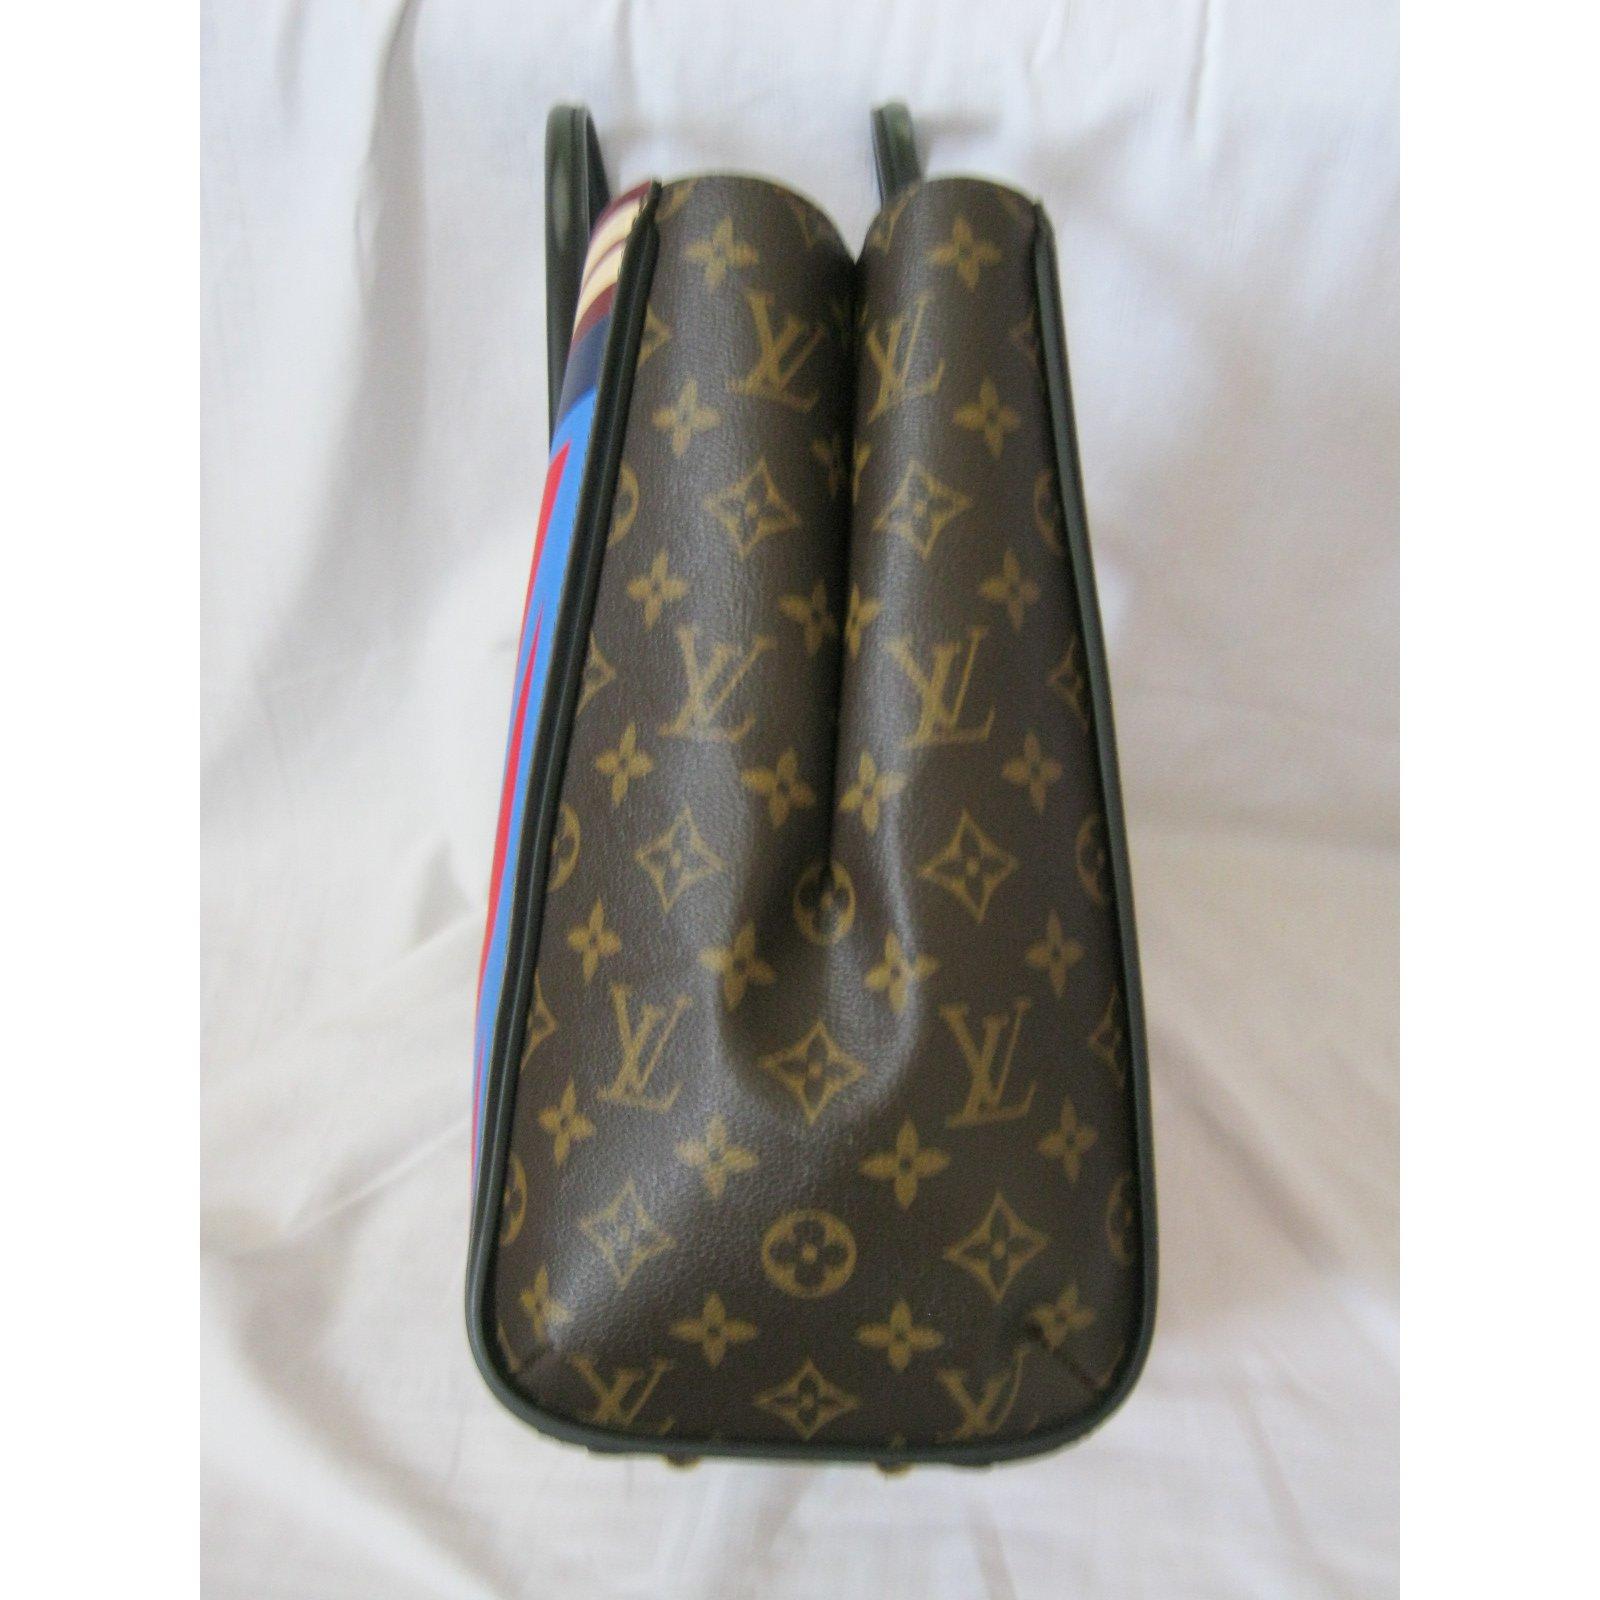 6fb3bfc8dc9a Louis Vuitton Limited Edition Kimono Tote Handbags Leather Brown ref.51382  - Joli Closet